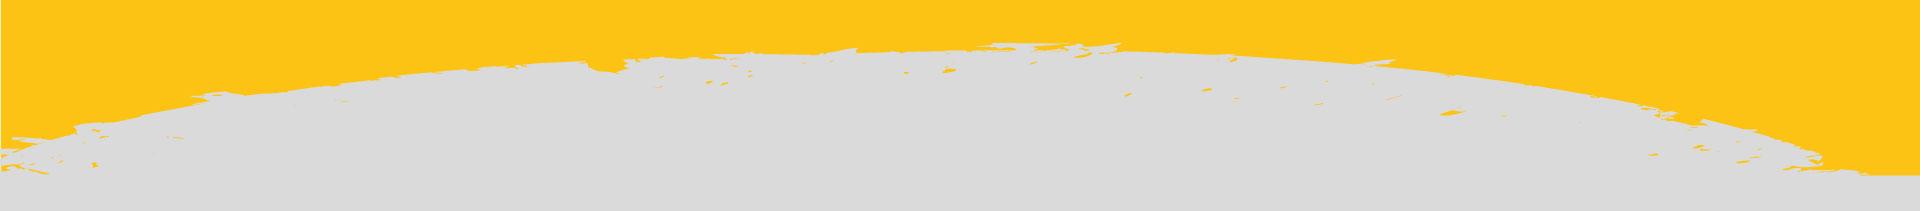 onde-giallo-grigie-cappelletto